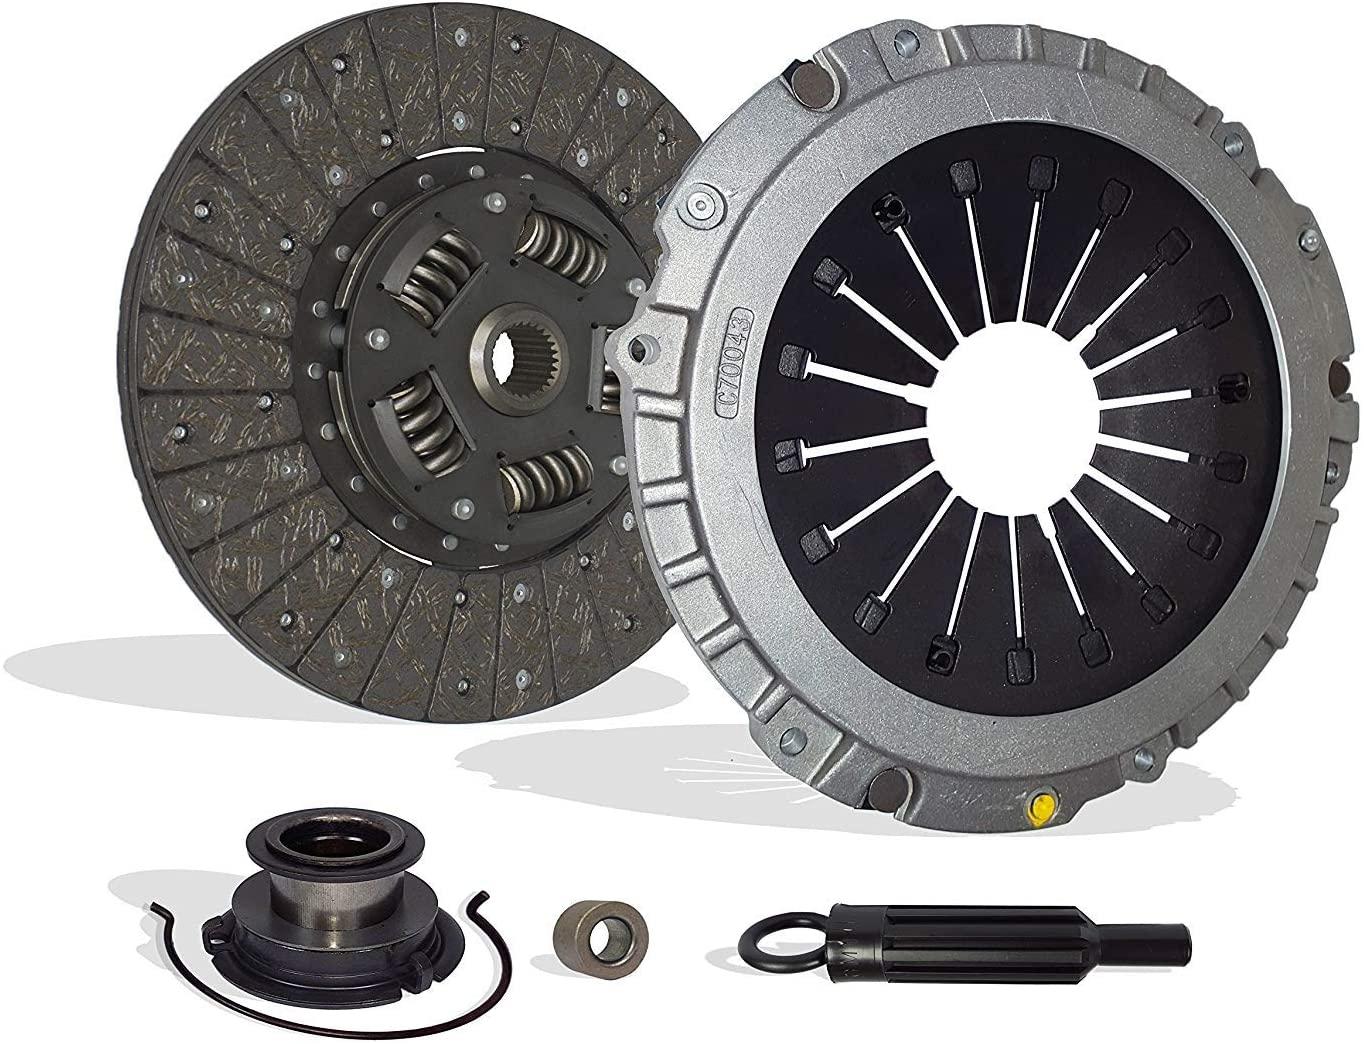 Southeast-clutch Clutch Kit compatible with Camaro Z28 Ss Firebird Formula Trans Am 5.7l V8 Lt1 (04-134A)